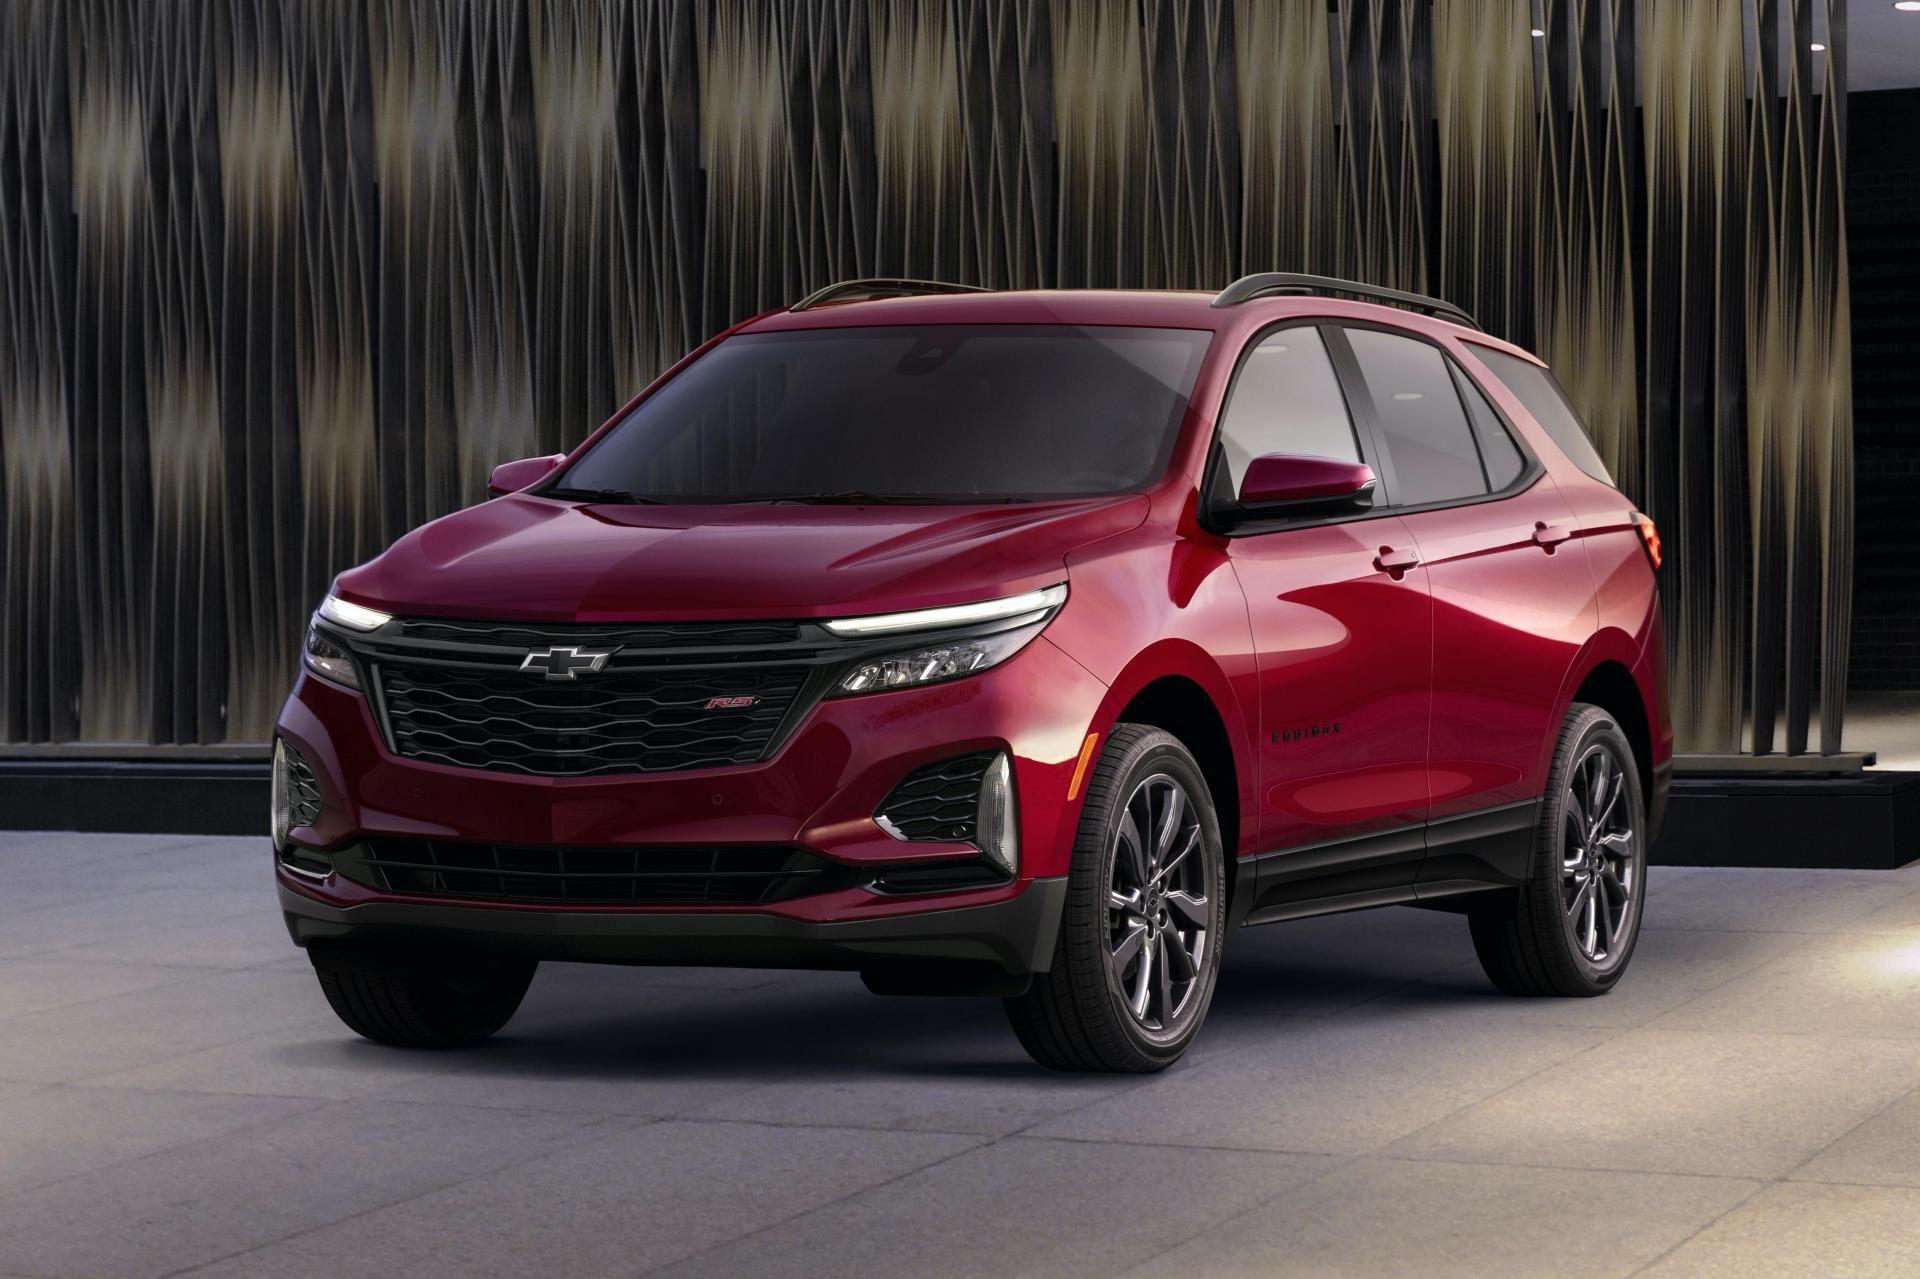 Chevrolet-Equinox-facelift-2020-1